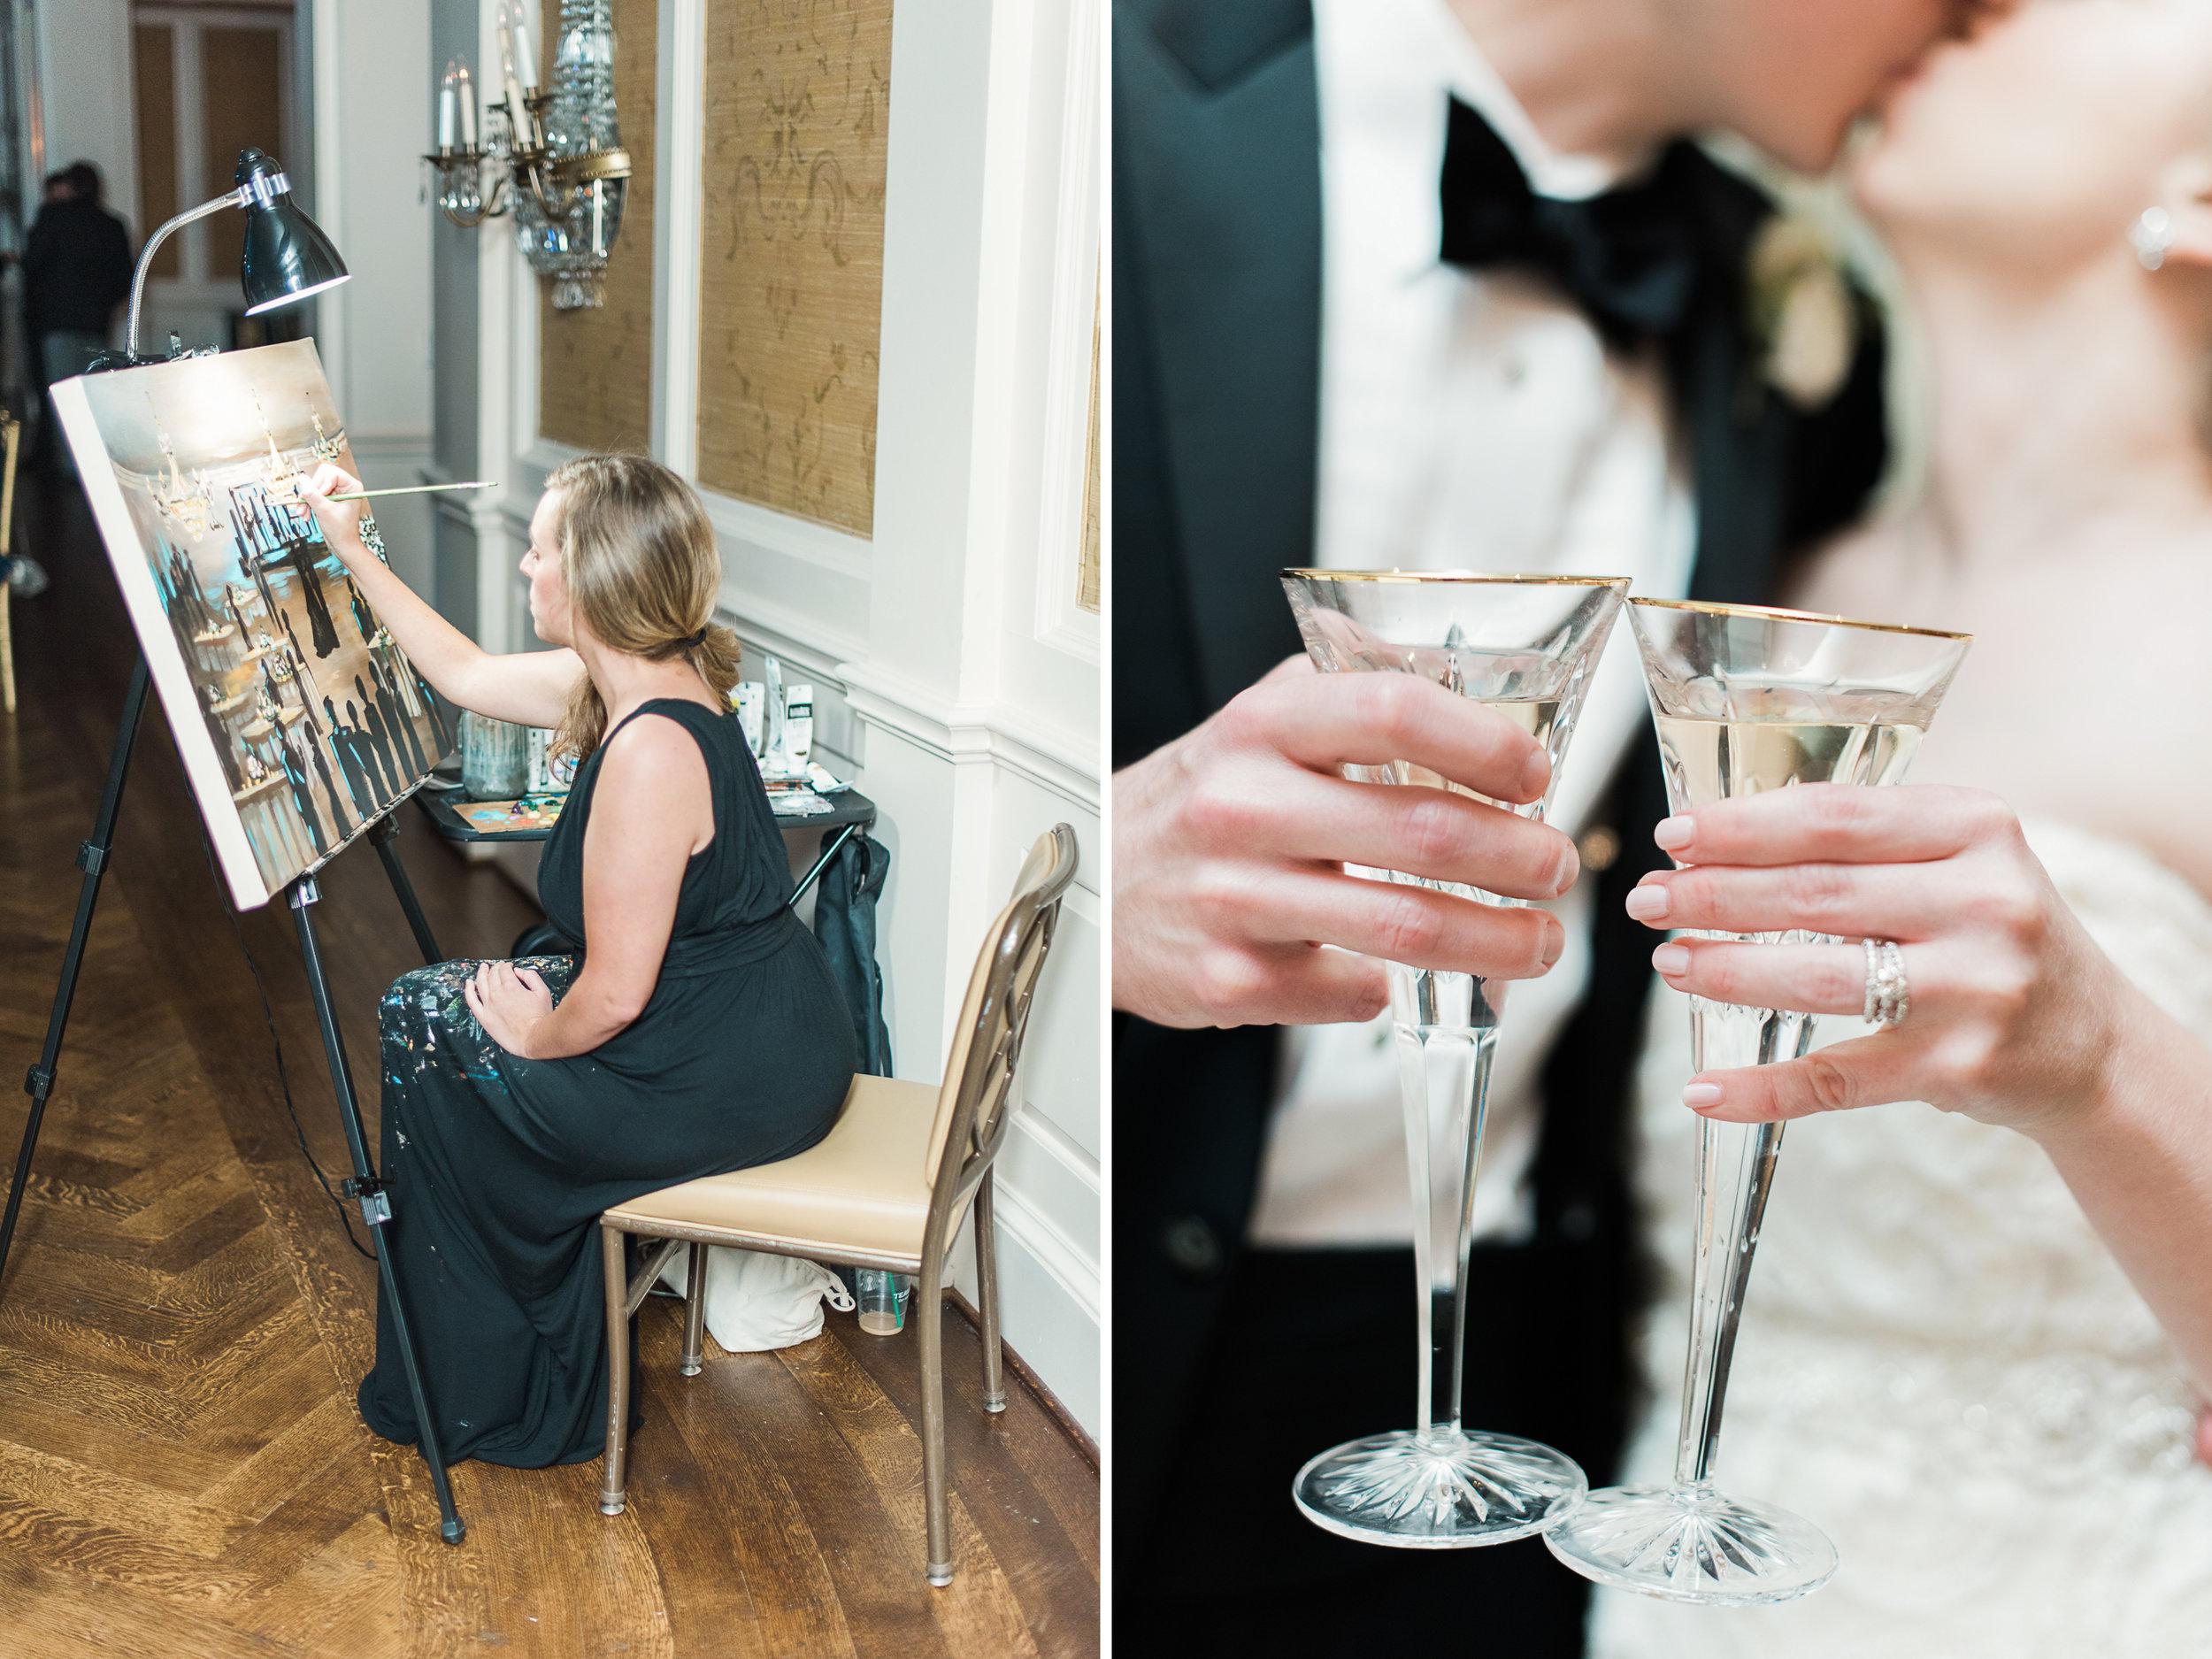 Fine-Art-Film-Houston-Wedding-Photographer-Best-Top-Luxury-Texas-Austin-Dallas-Destination-Dana-Fernandez-Photography-River-Oaks-Country-Club-South-Main-Baptist-Ceremony-Reception-Wedding-139.jpg